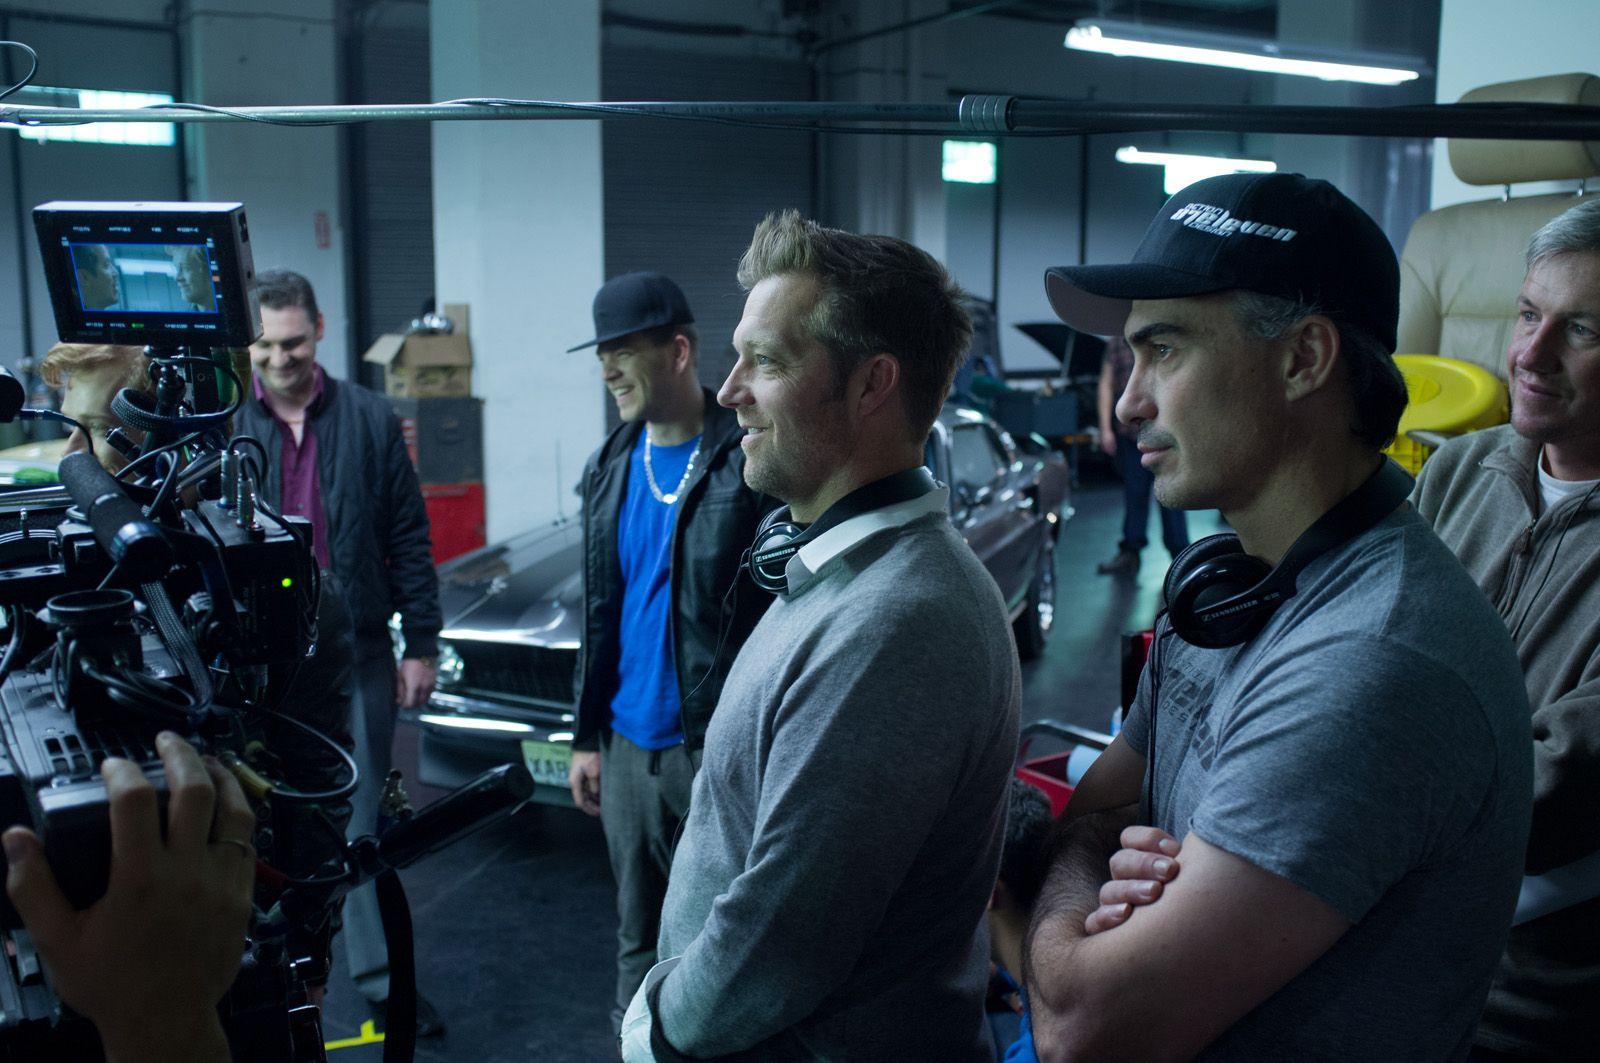 david leitch chad stahelski - 'John Wick' Director Chad Stahelski to Helm Darkish Fantasy 'Sandman Slim' for Studio eight